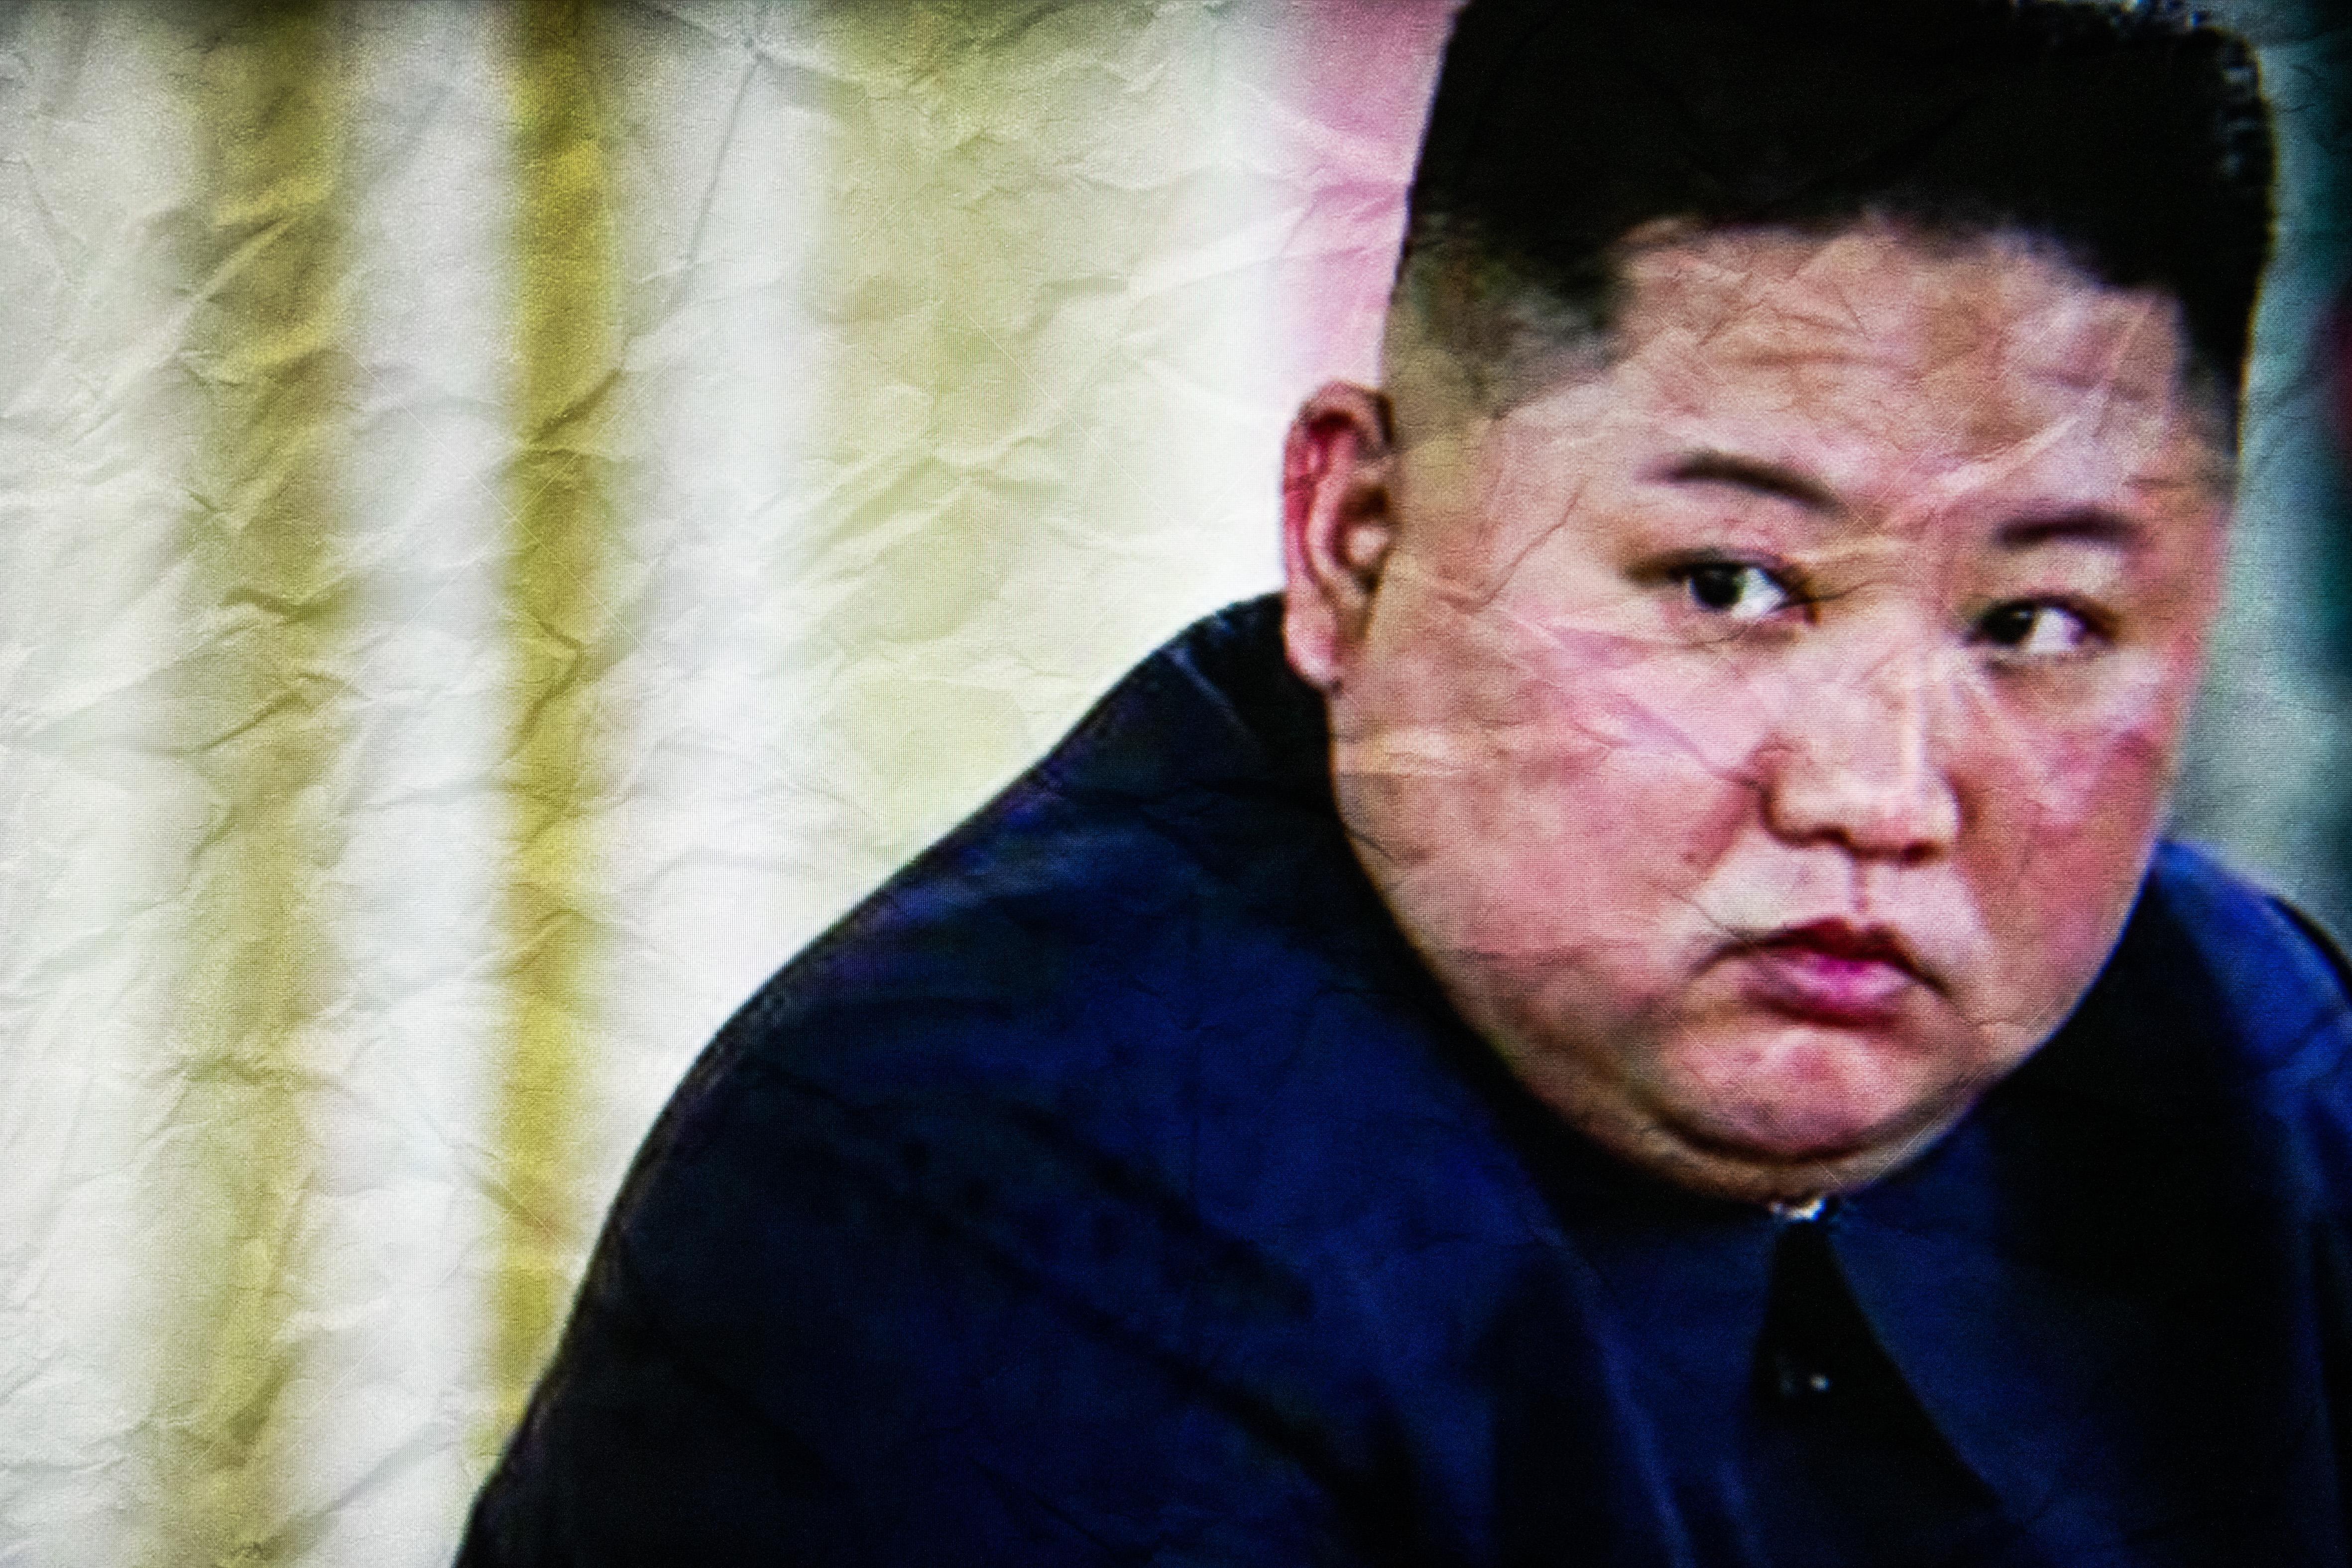 Hard Numbers: North Korea tests Biden, Asian American discrimination, Suez blockage, big banks finance fossil fuels